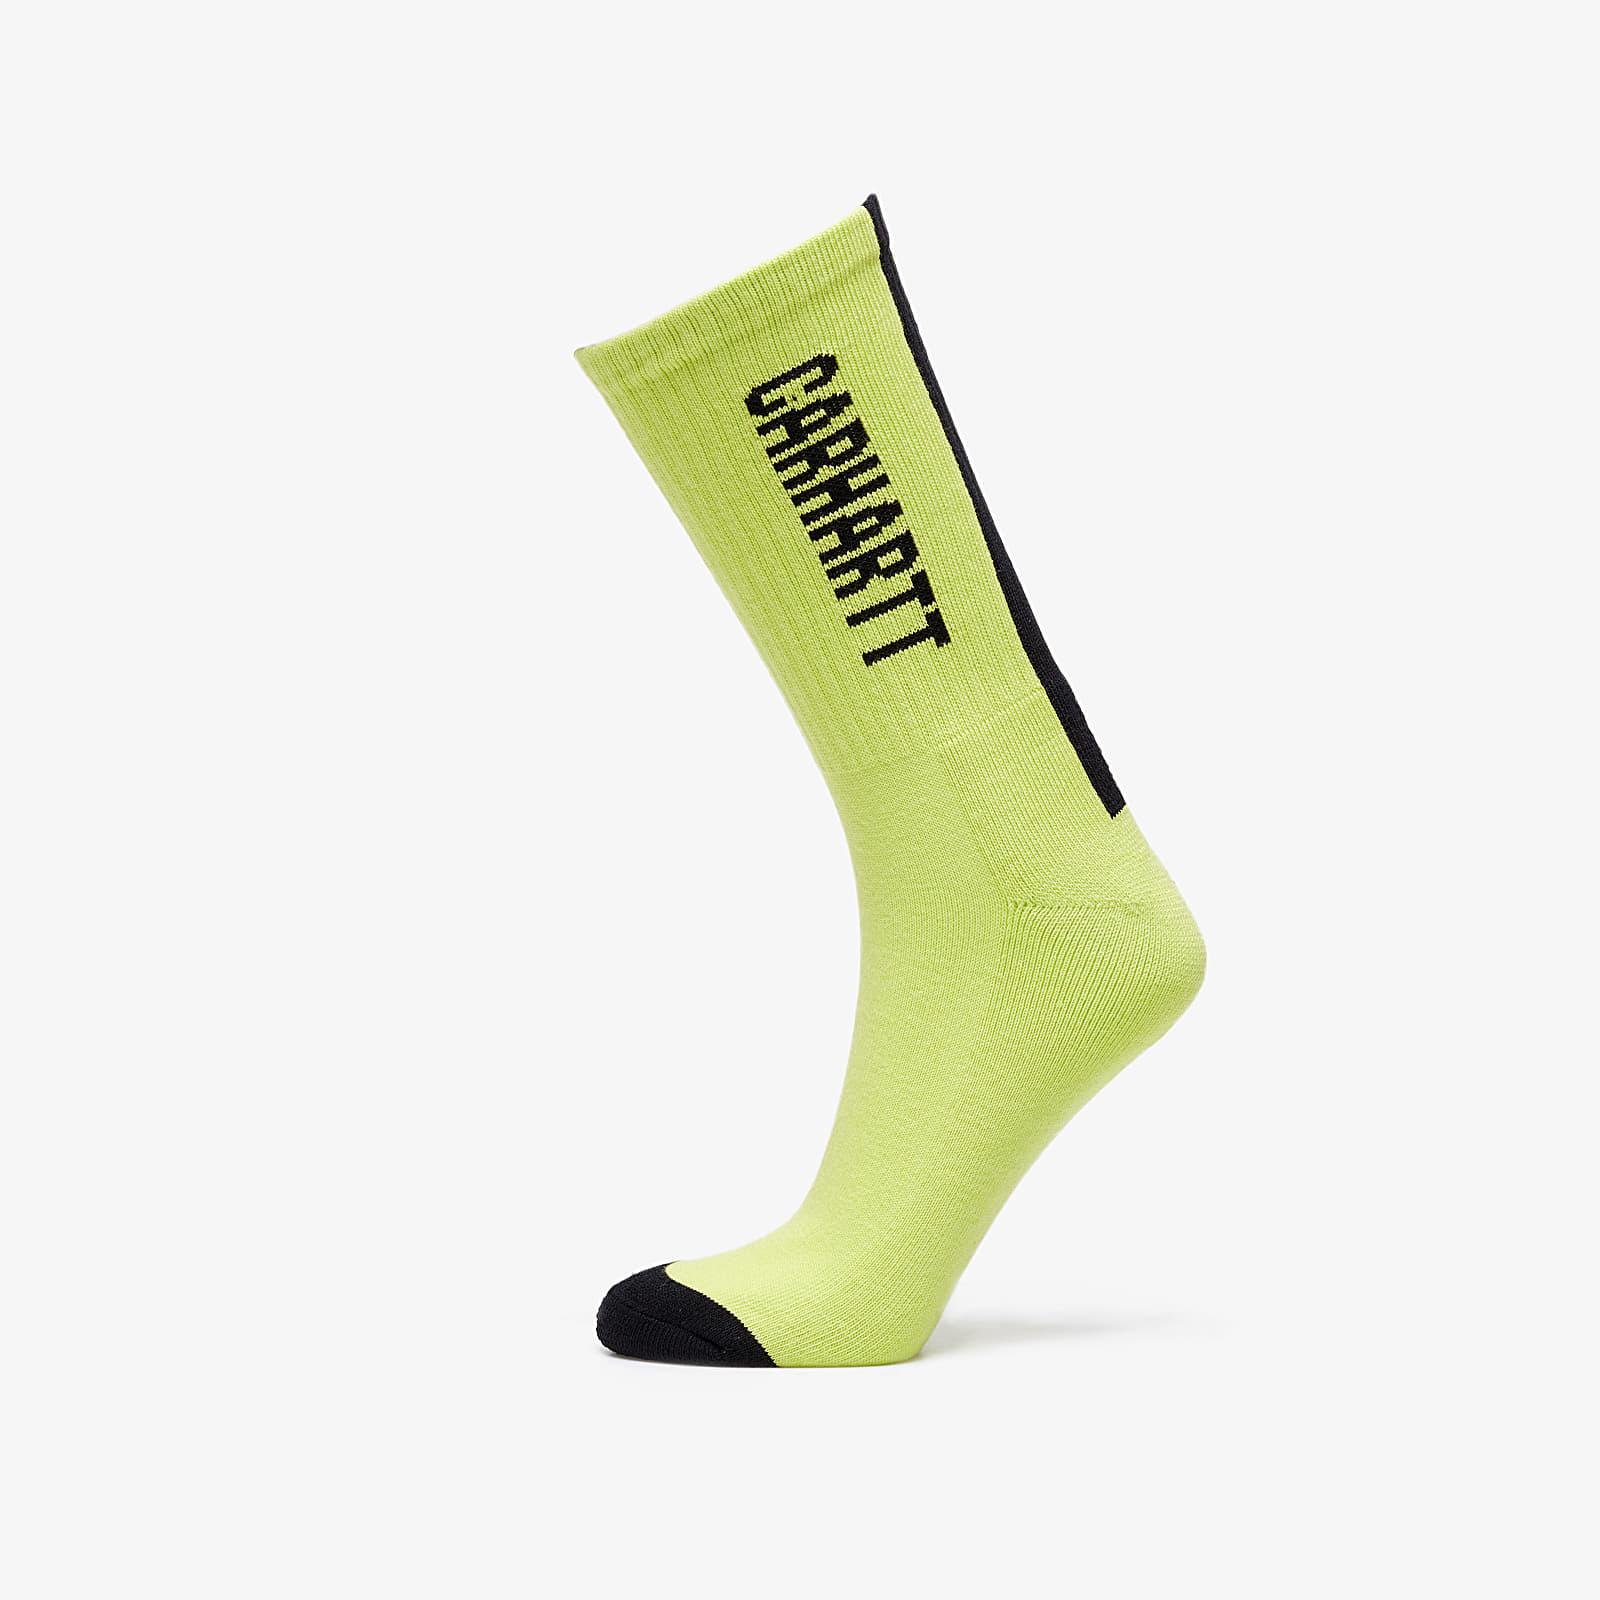 Carhartt WIP Turner Socks